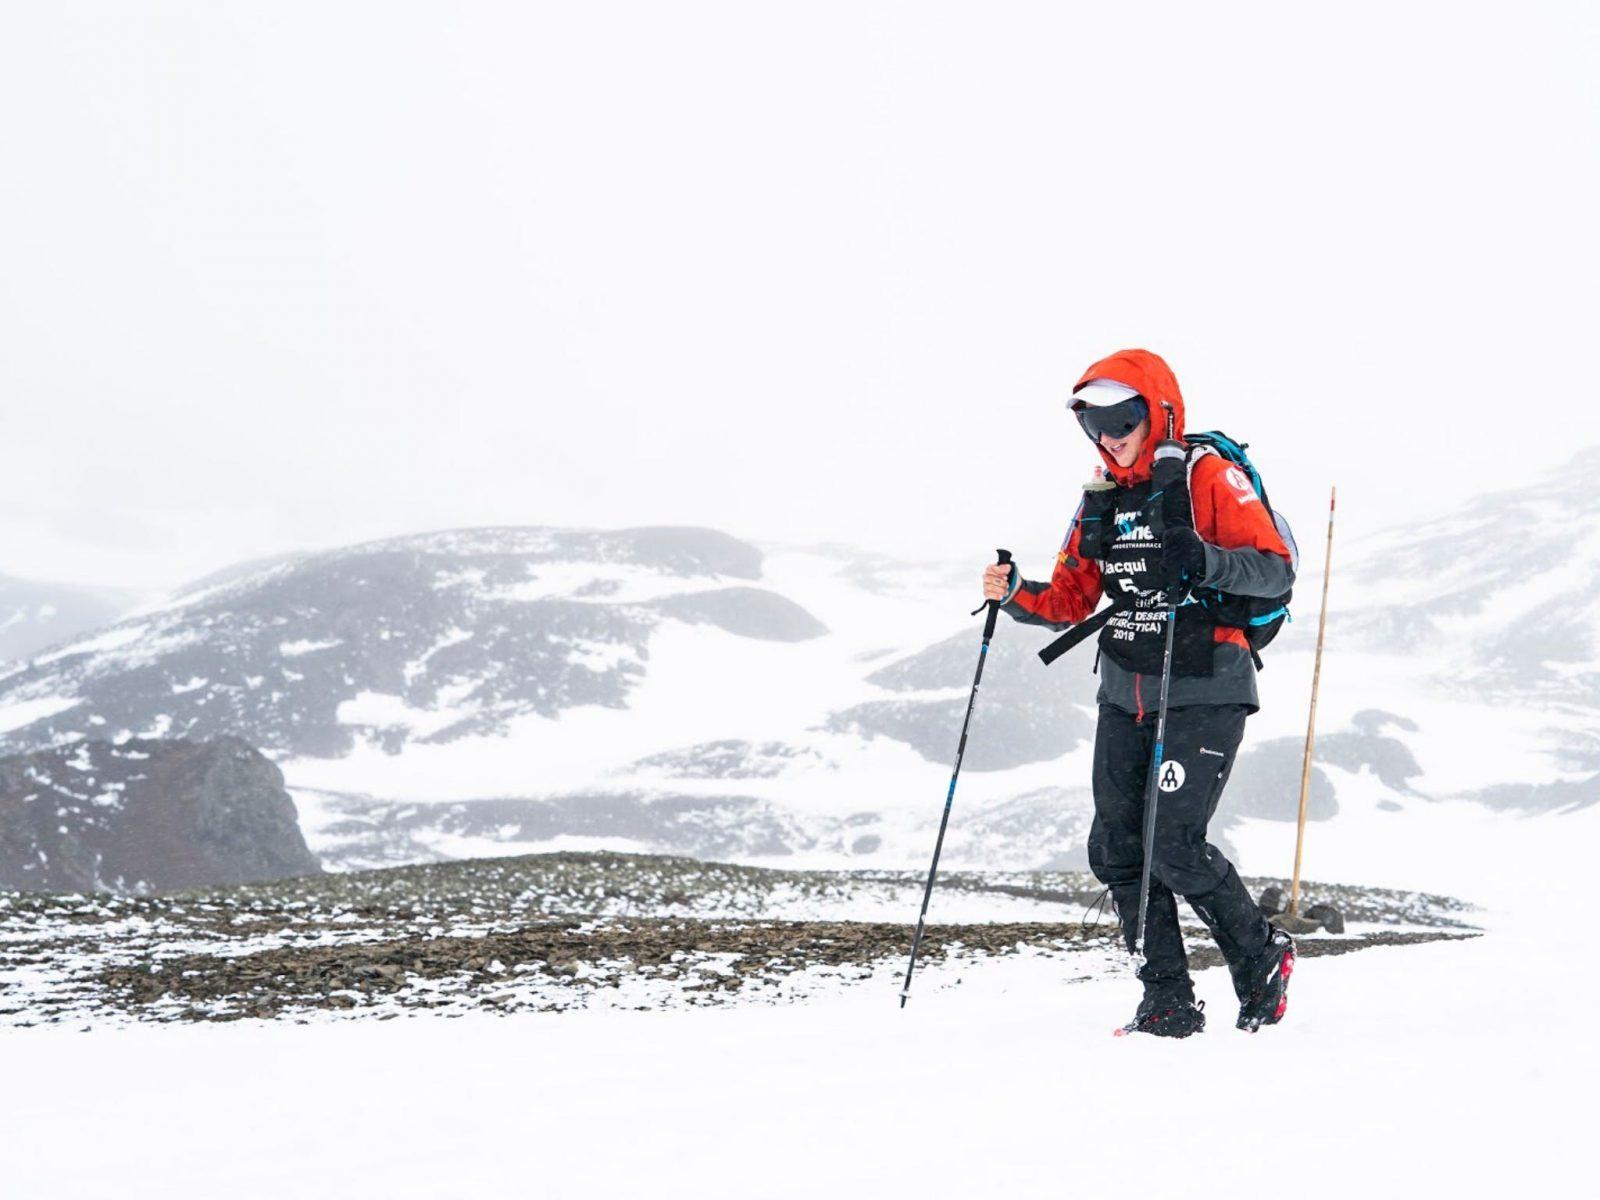 Antarctica 250km Multi Stage Ultra Marathon in 2019 the 4th and final desert